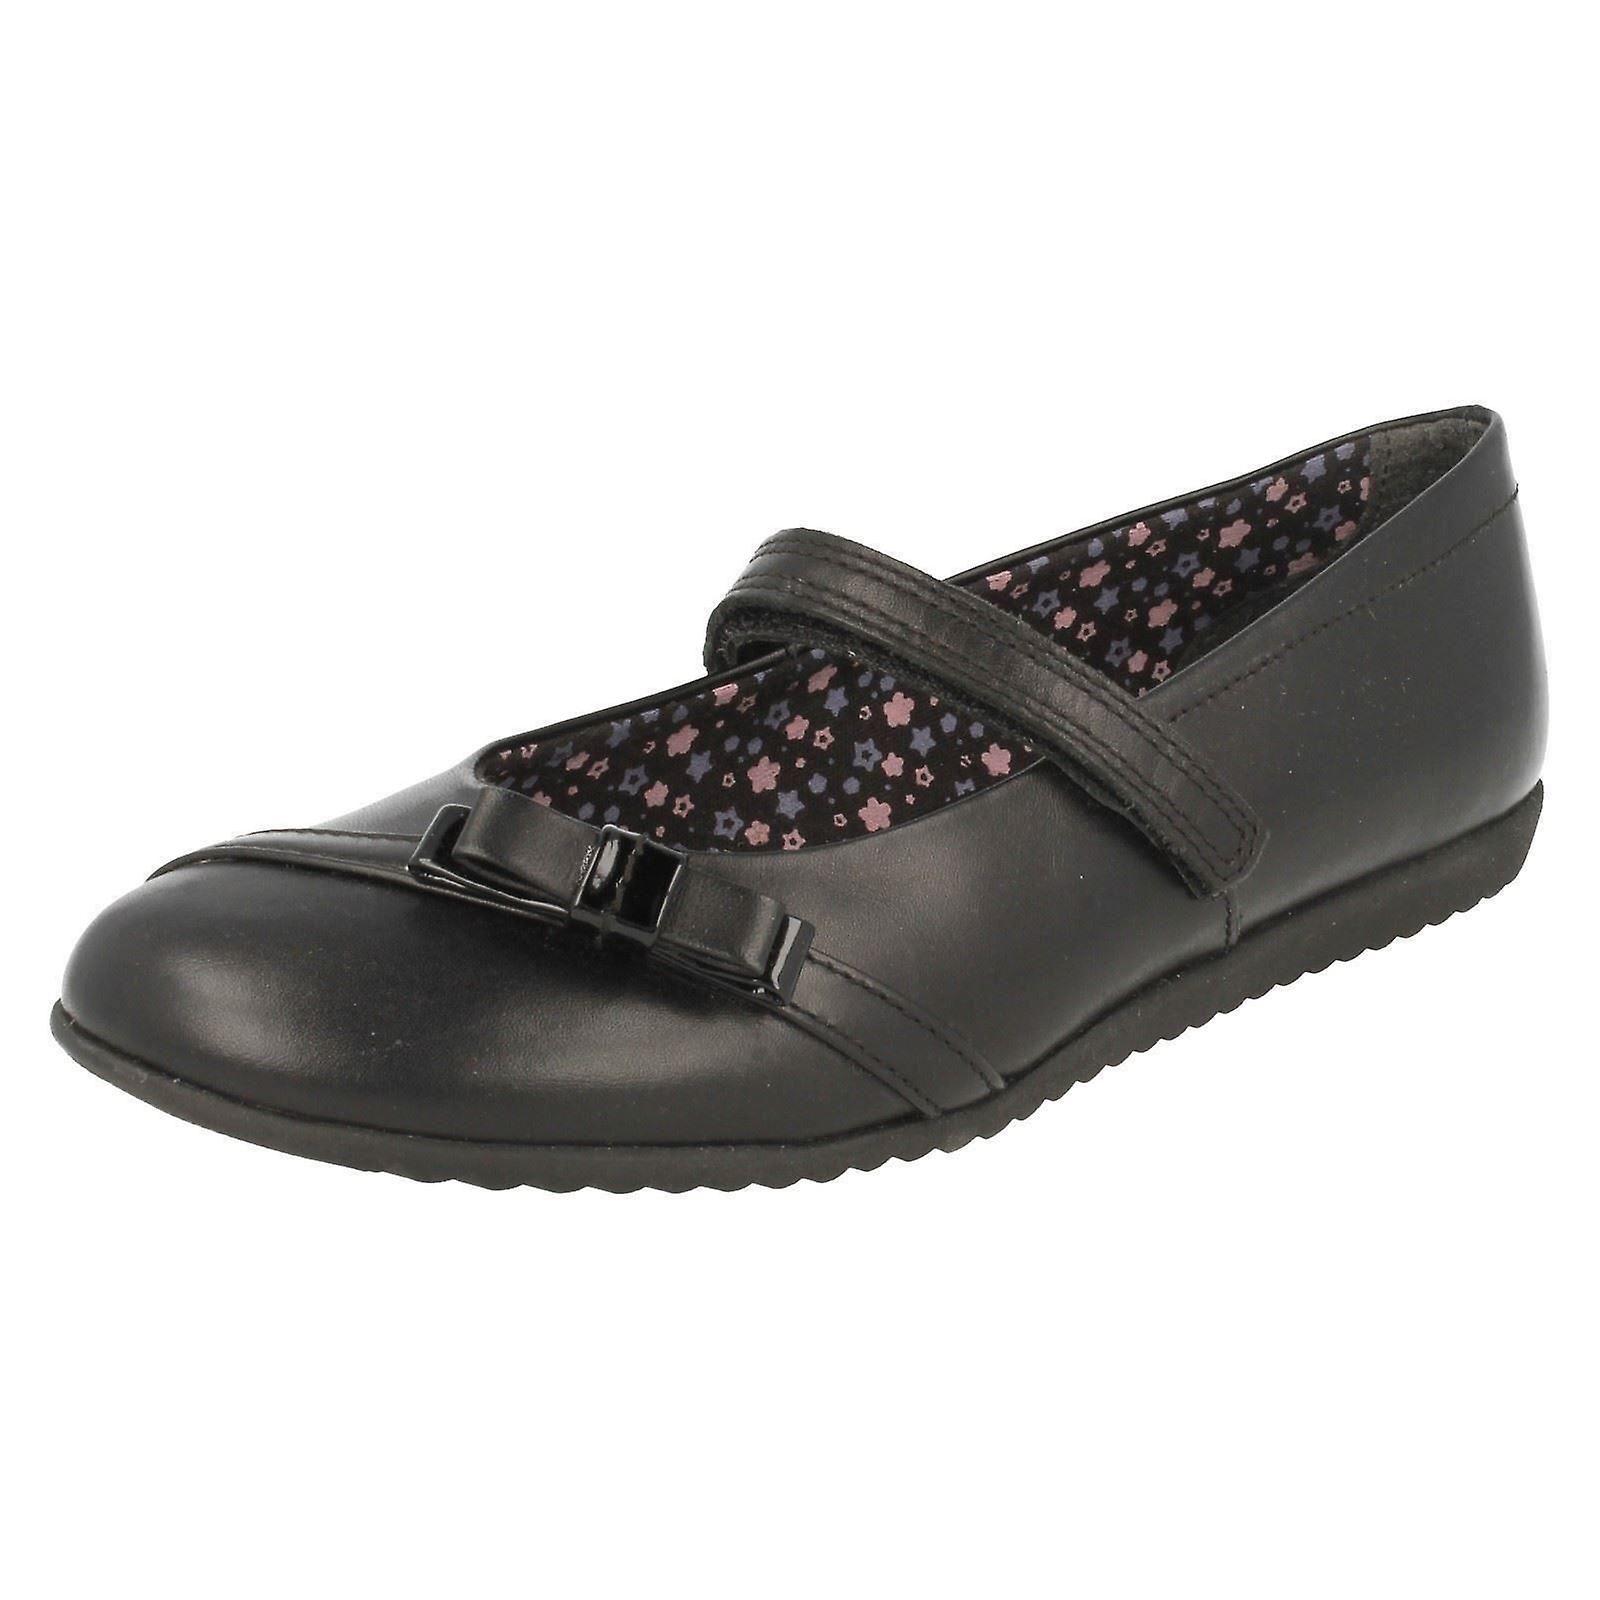 Senior filles Startrite chaussures Rigel